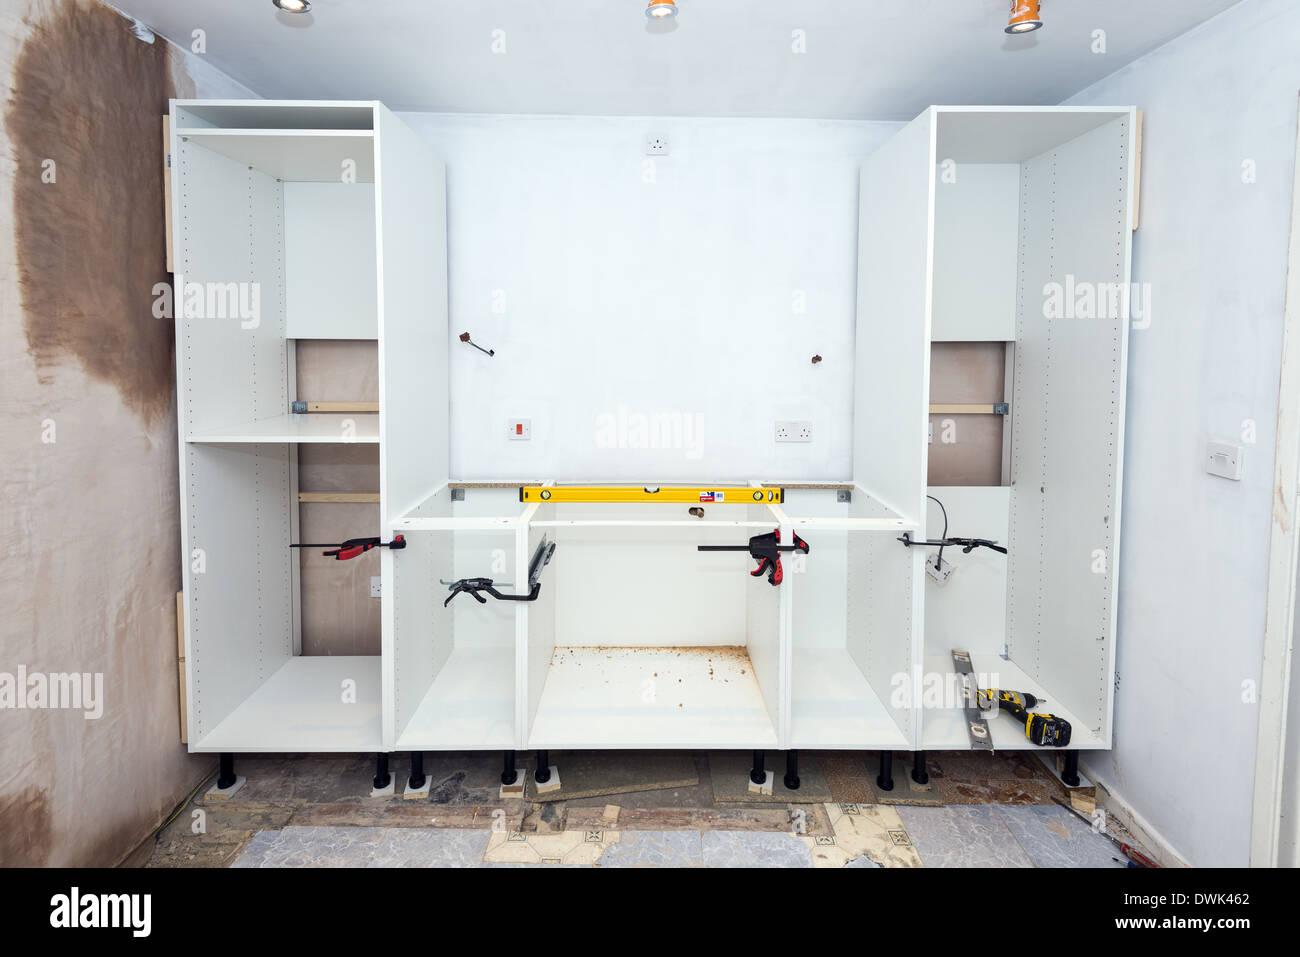 Diy Half Built Kitchen Installation Stock Photo Alamy